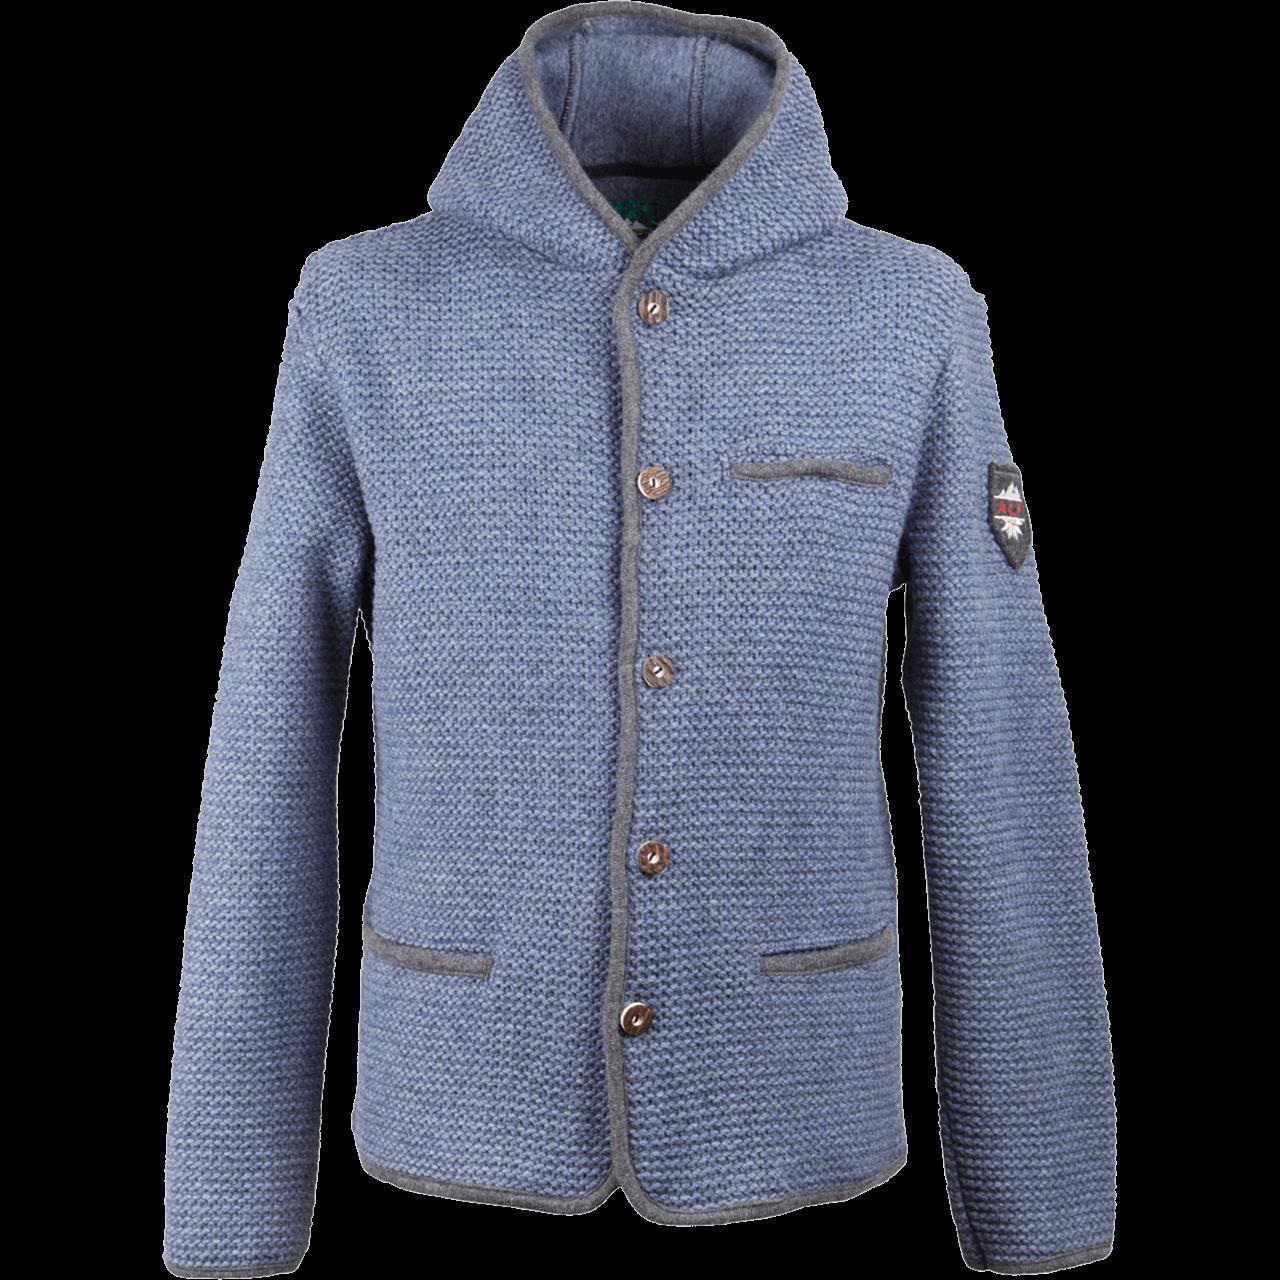 giacca-uomo-343001-alp1964